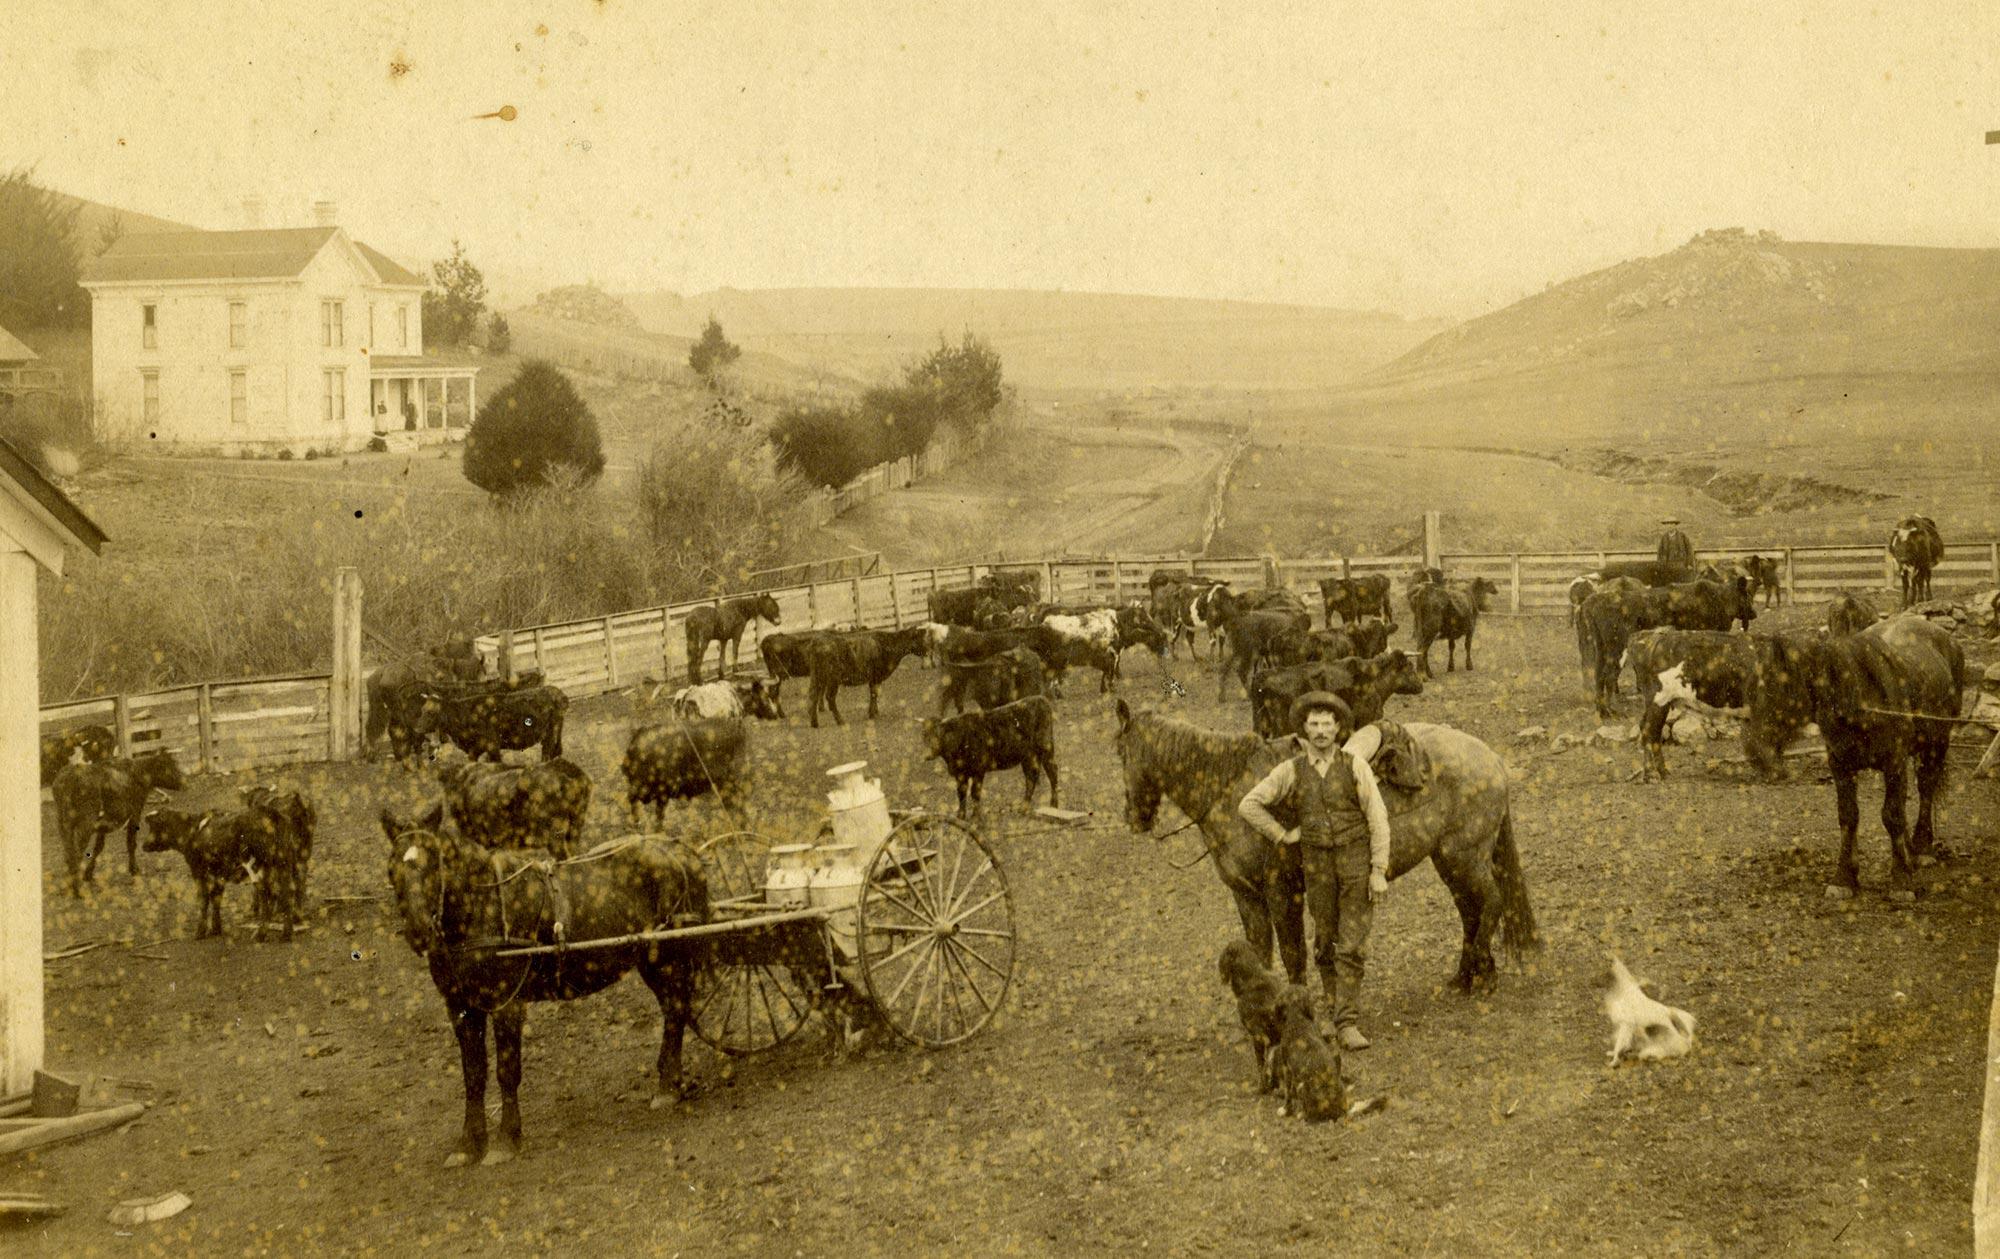 Luke Fallon Ranch